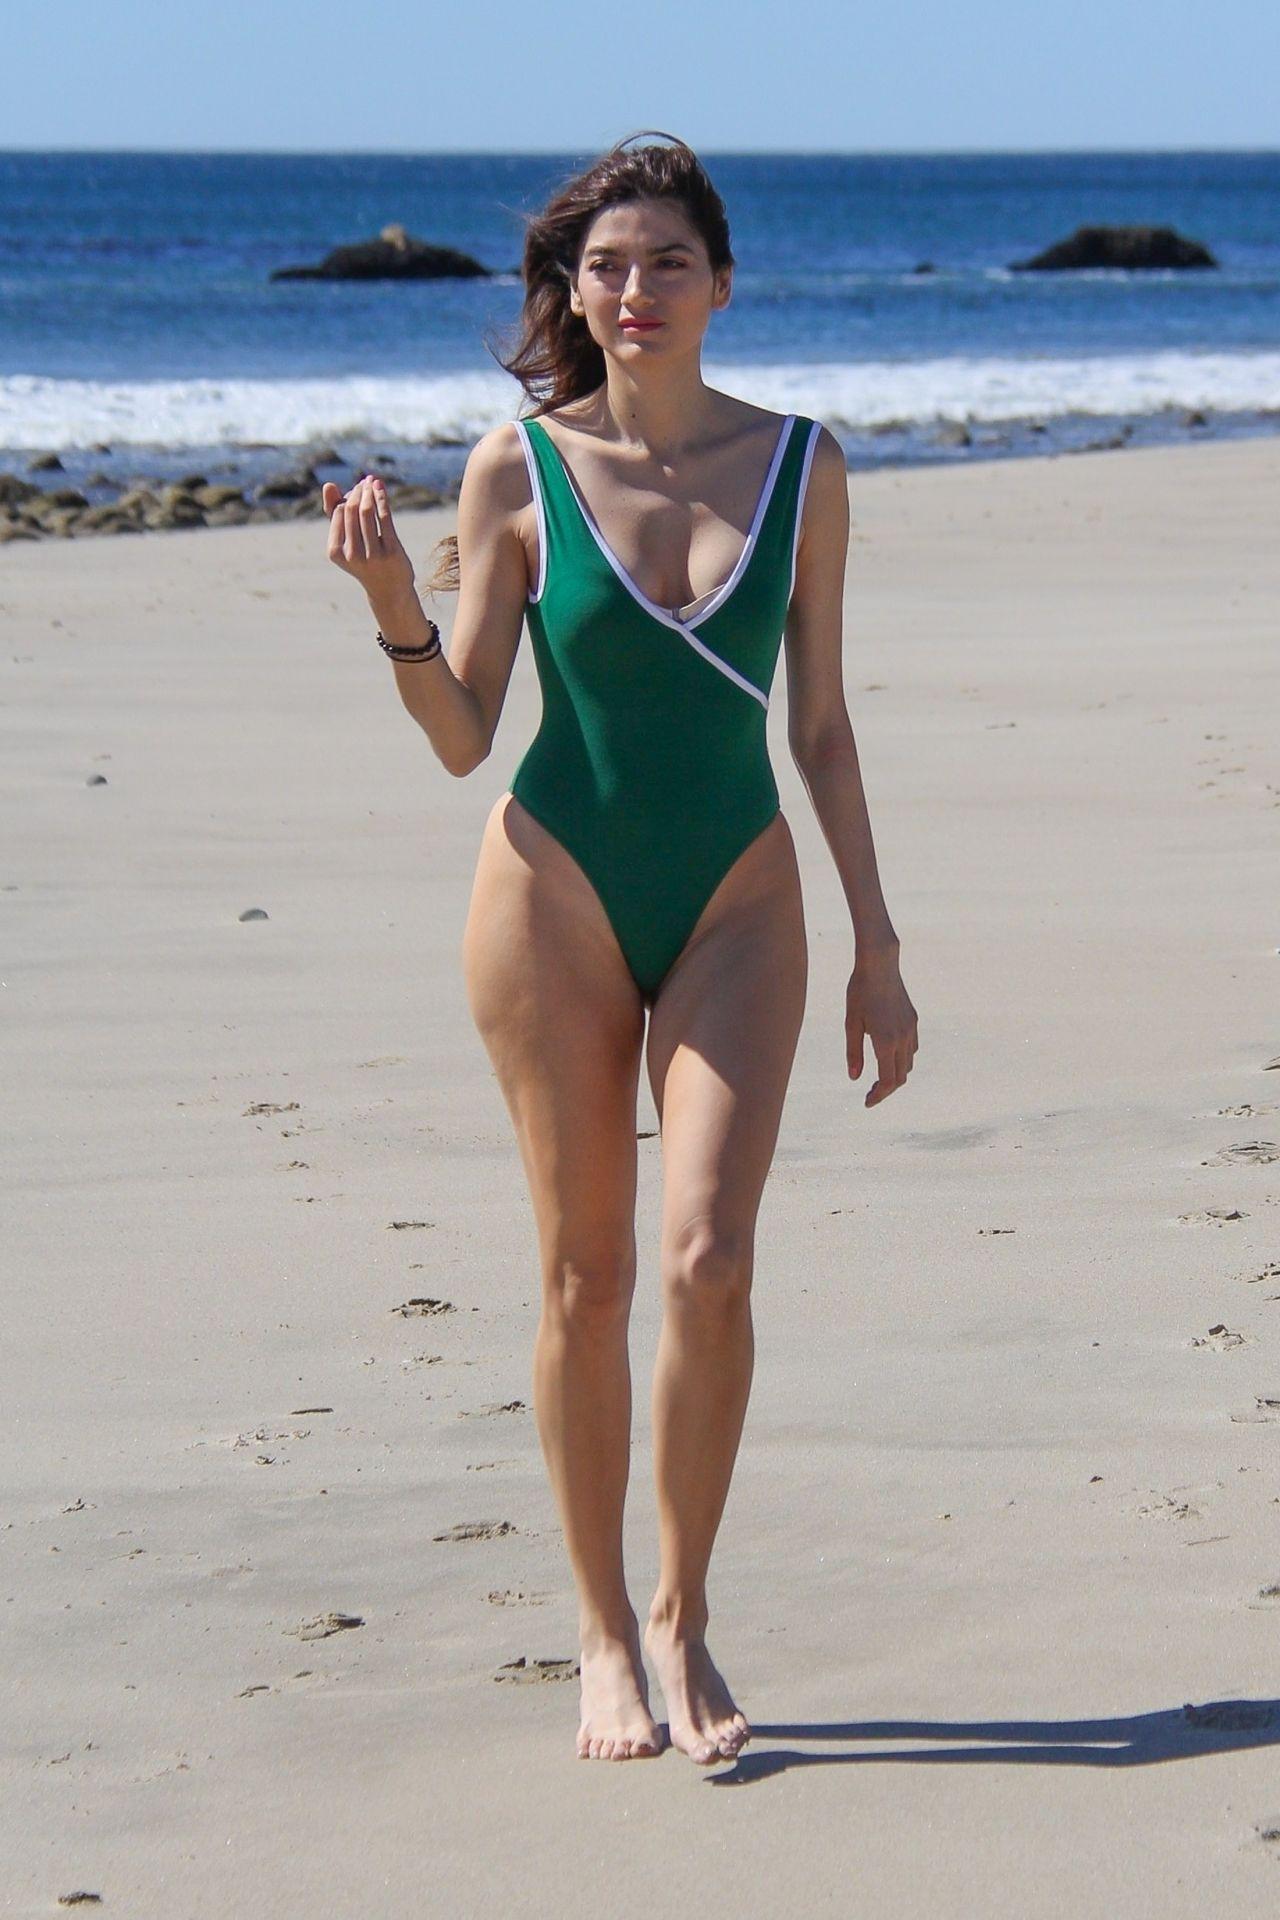 Paparazzi Bella Banos nude (64 photo), Sexy, Sideboobs, Twitter, legs 2006